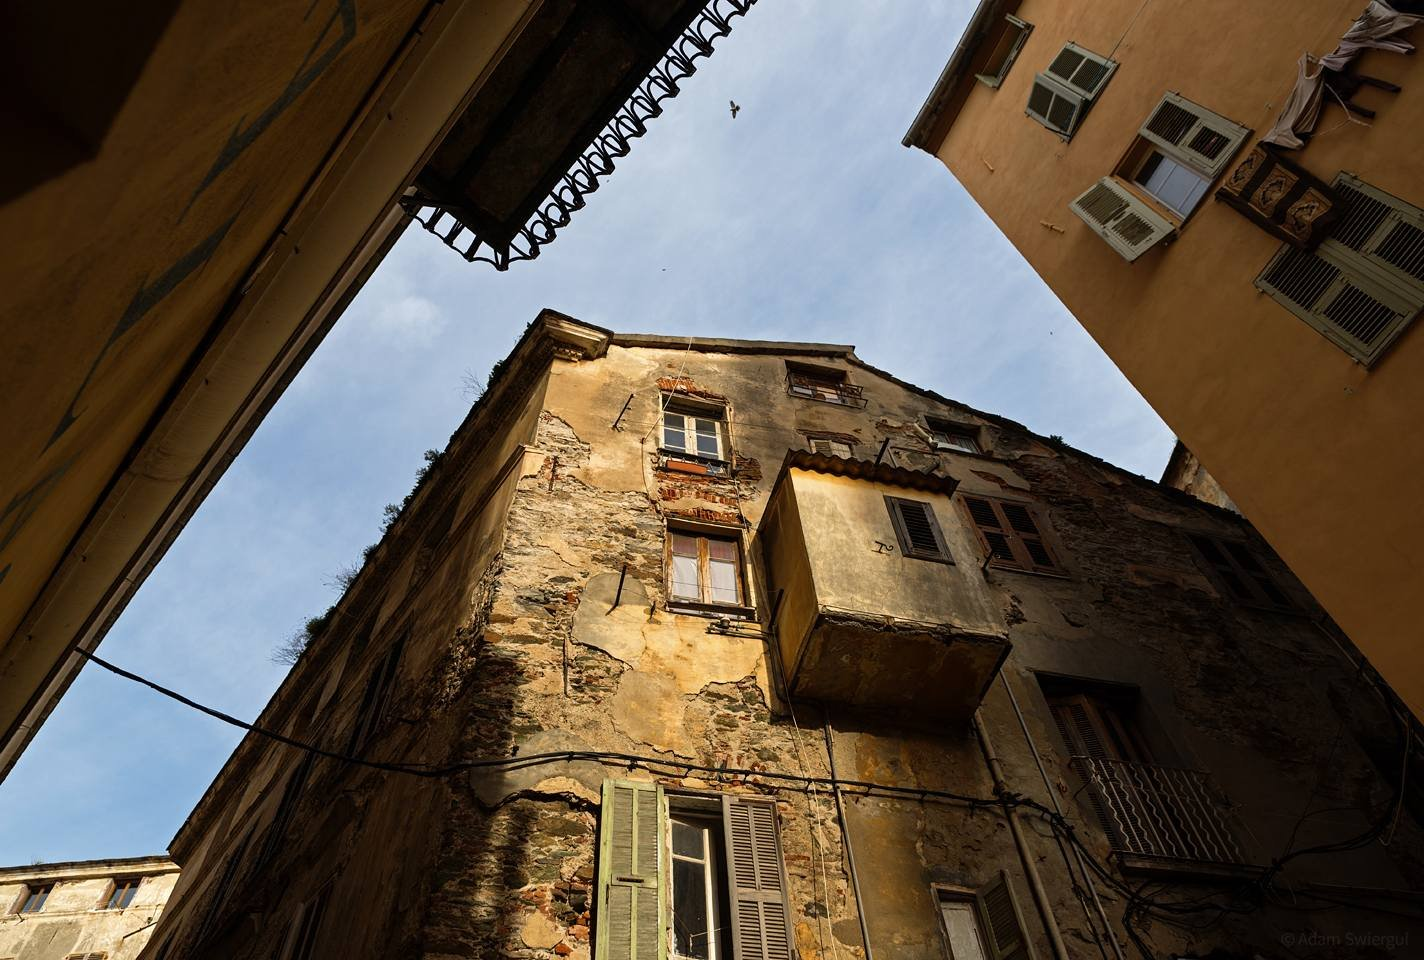 Kamienice do góry - Bastia